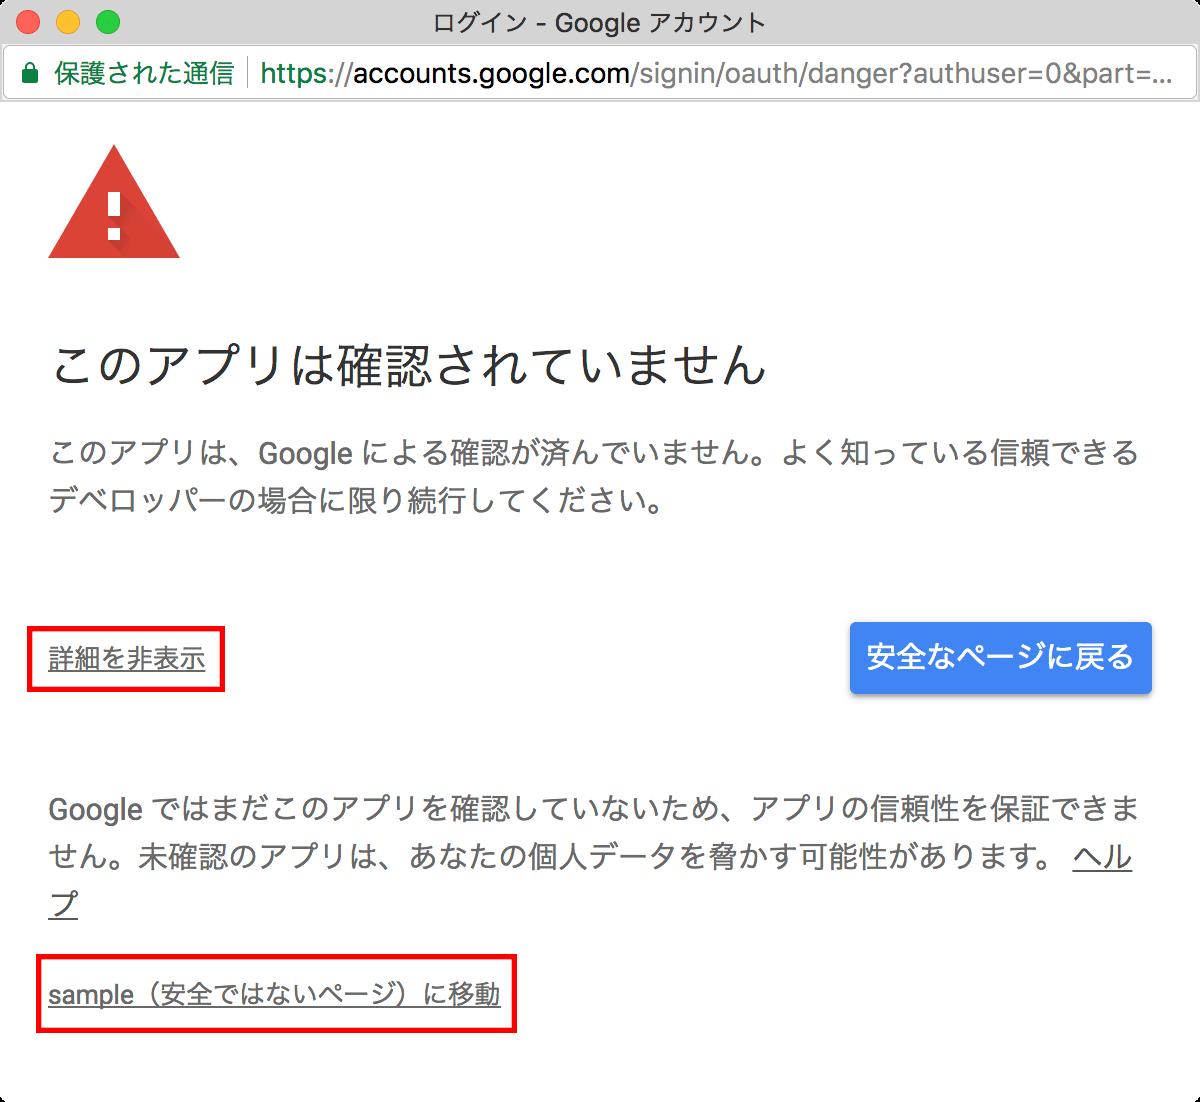 Google Apps Scrtiptで「このアプリは確認されていません」と表示された場合は「詳細」をクリックして承認